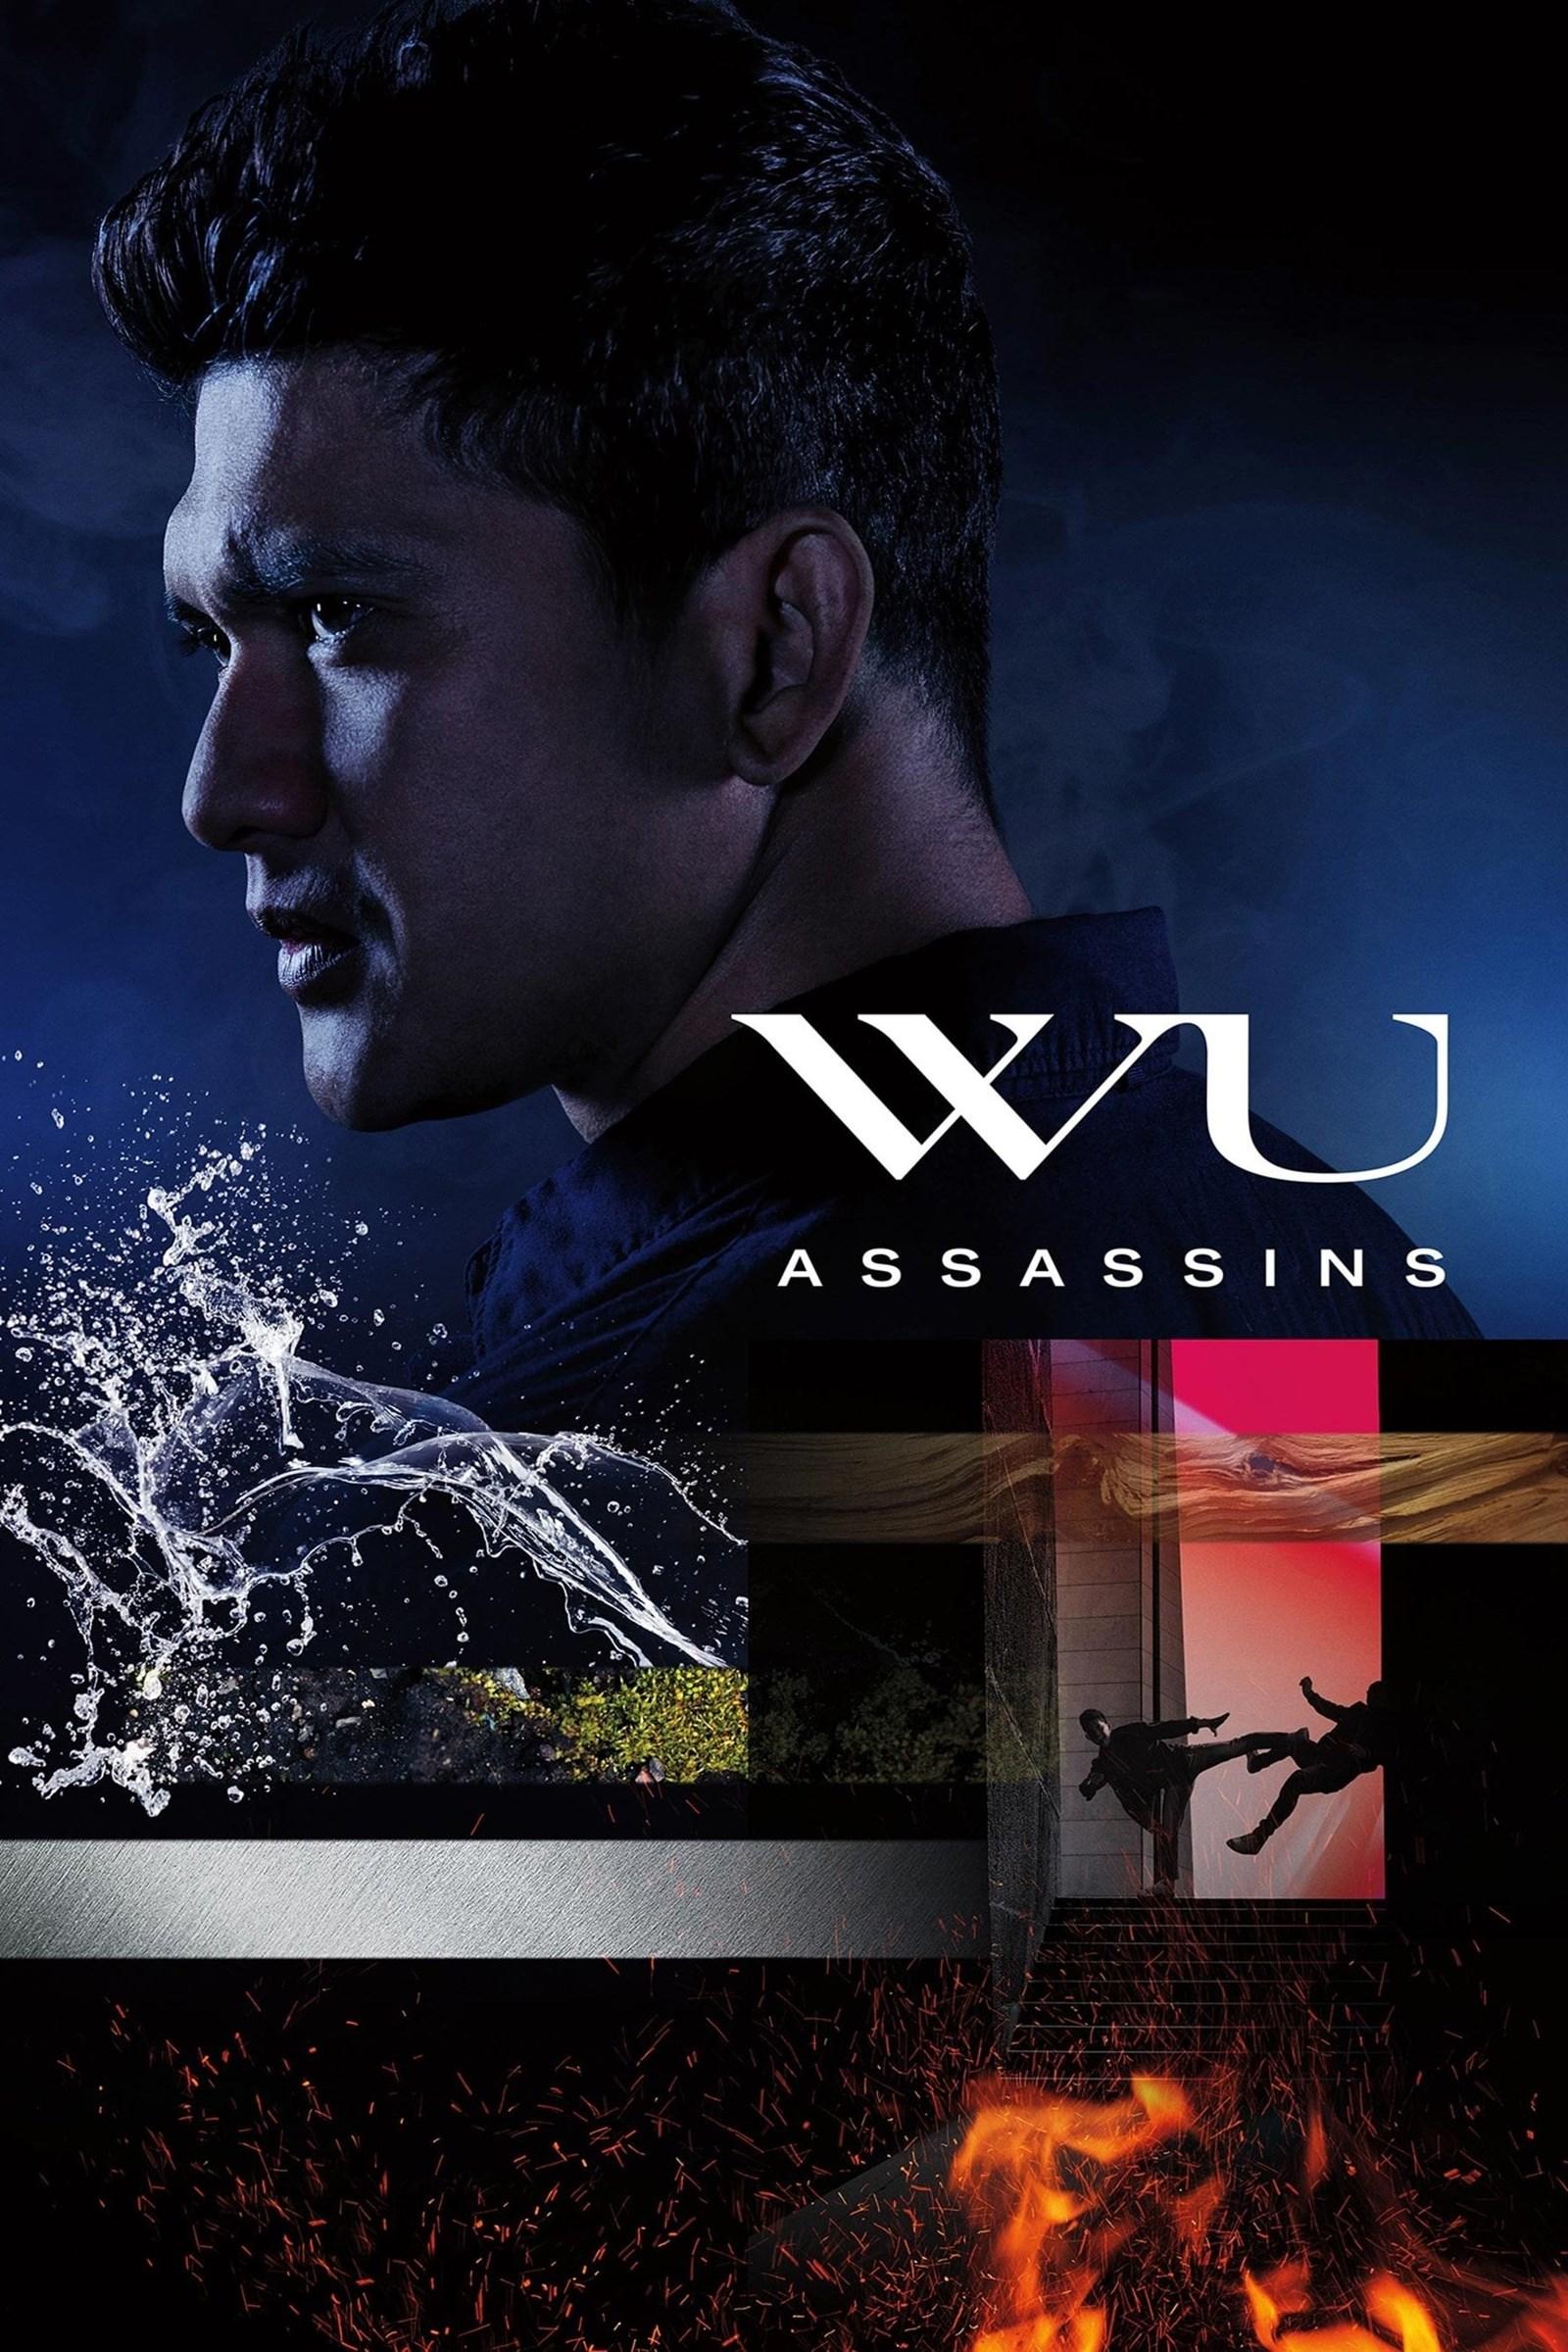 Subscene - Wu Assassins English subtitle